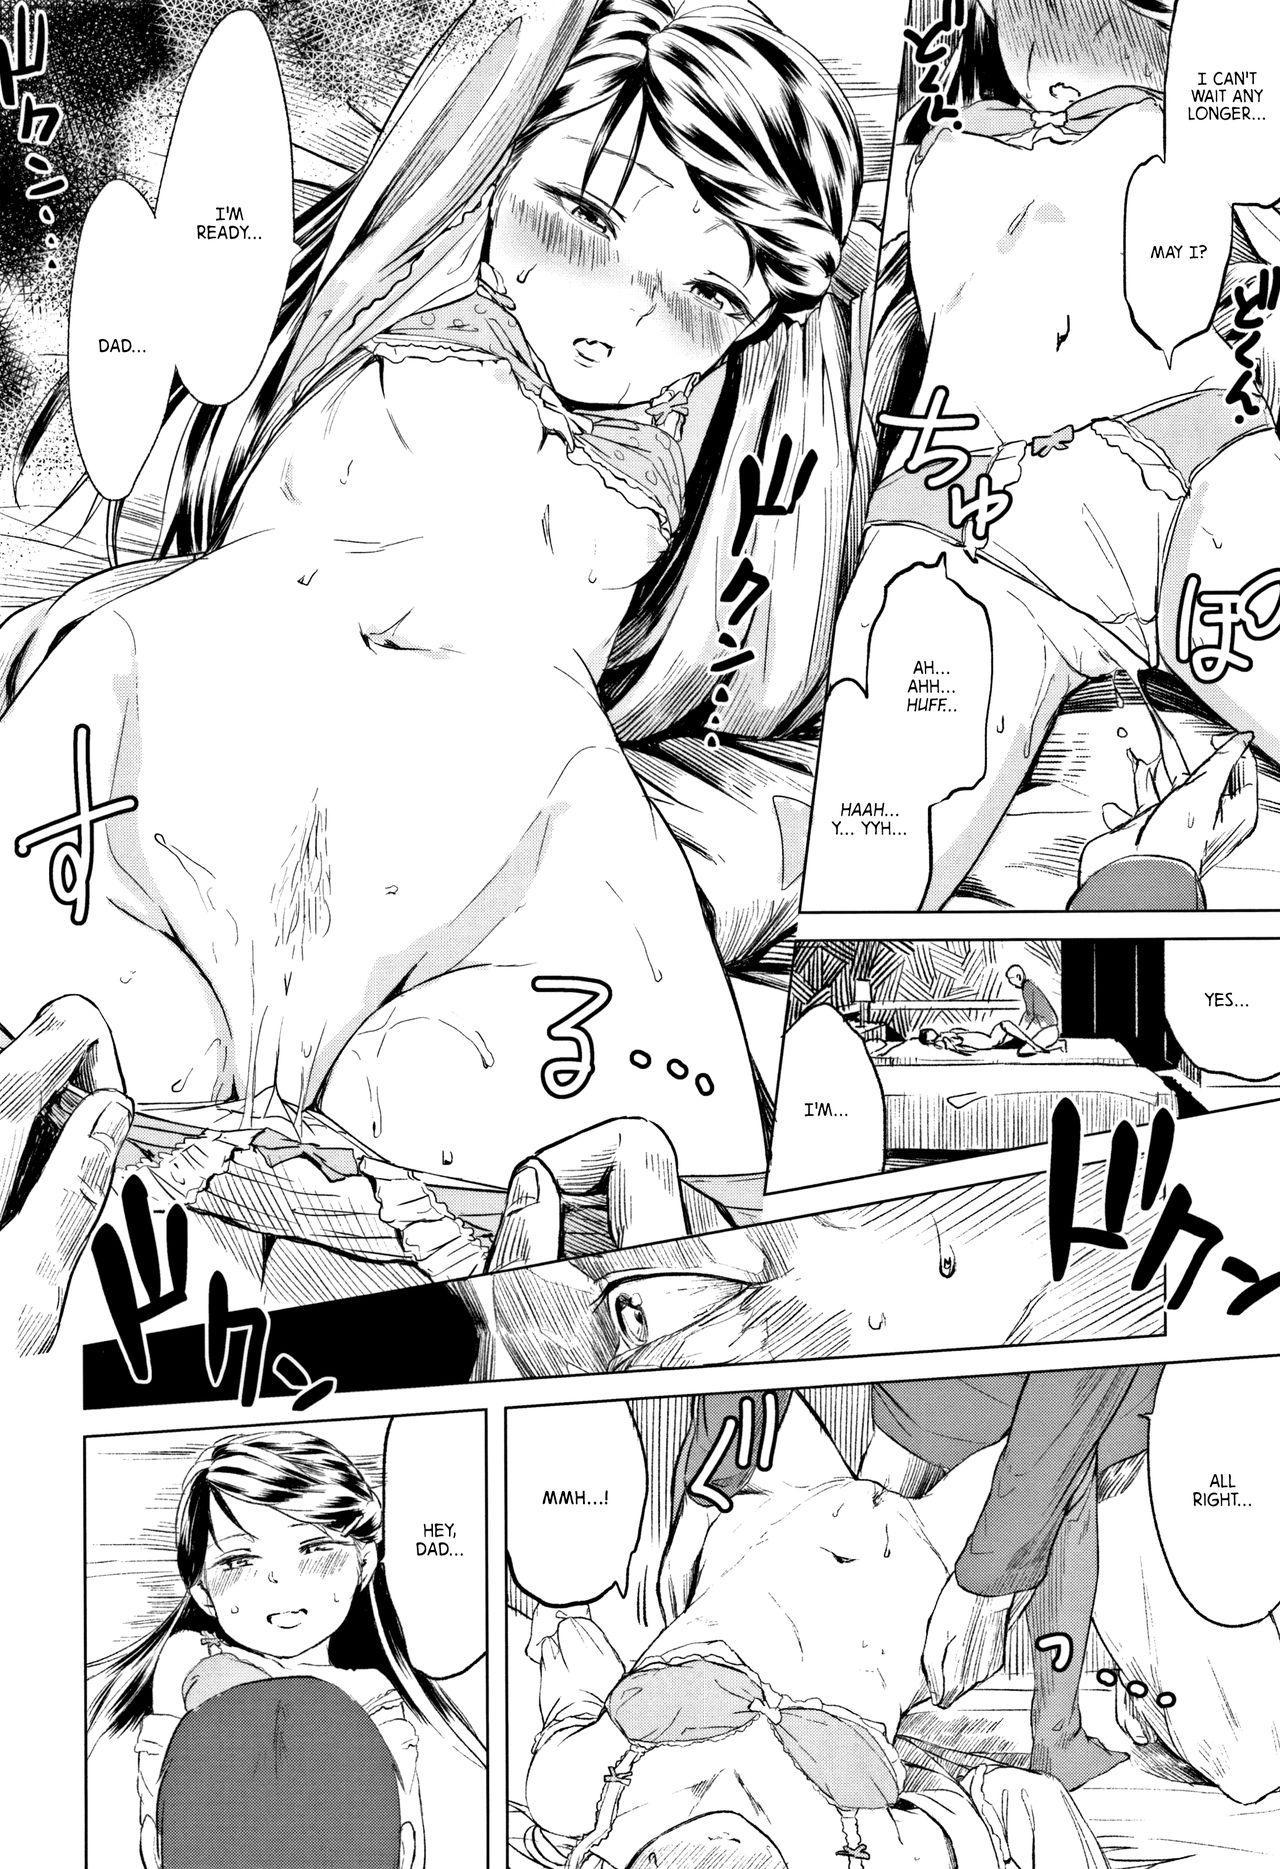 Chichi to Musume no Seiai Hakusho | Father and daughter sex white paper 203